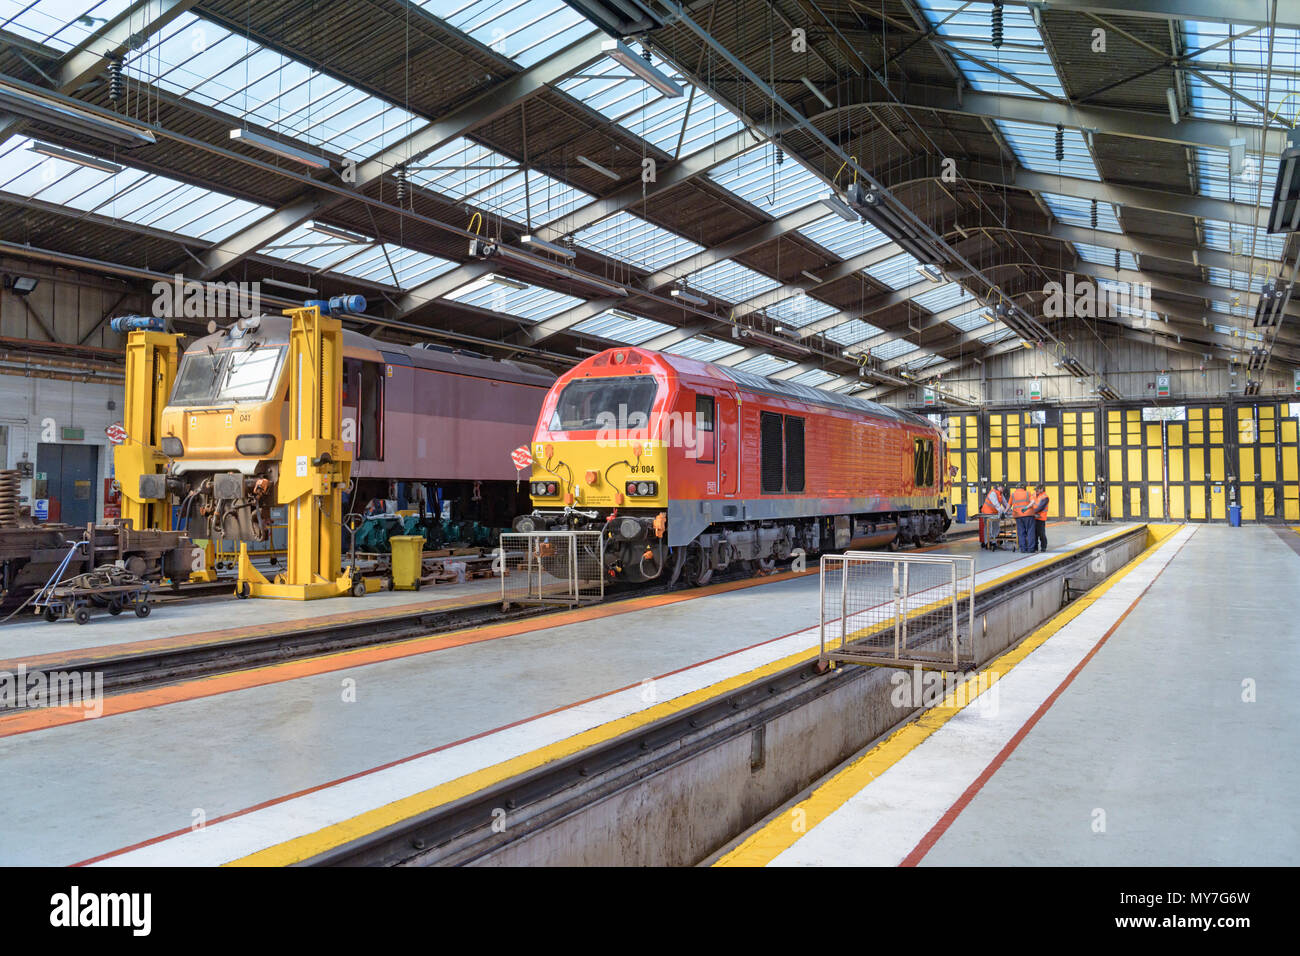 Locomotive being refurbished in train engineering factory - Stock Image